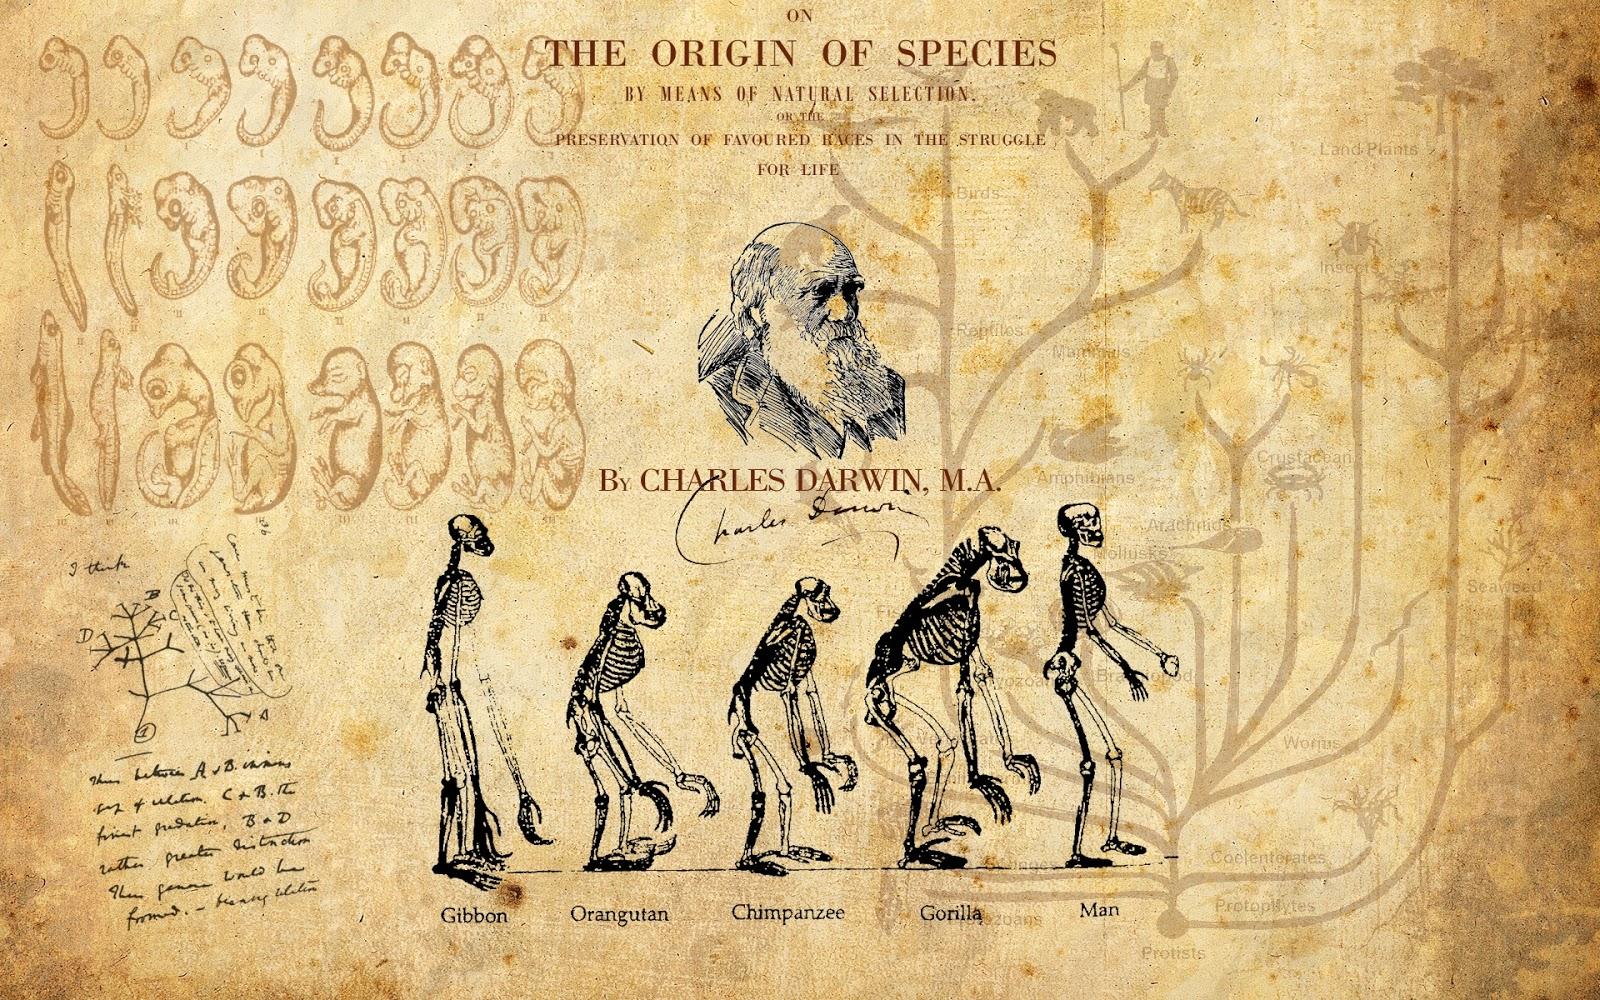 Best 52 Charles Darwin Wallpaper on HipWallpaper Attitude 1600x1000